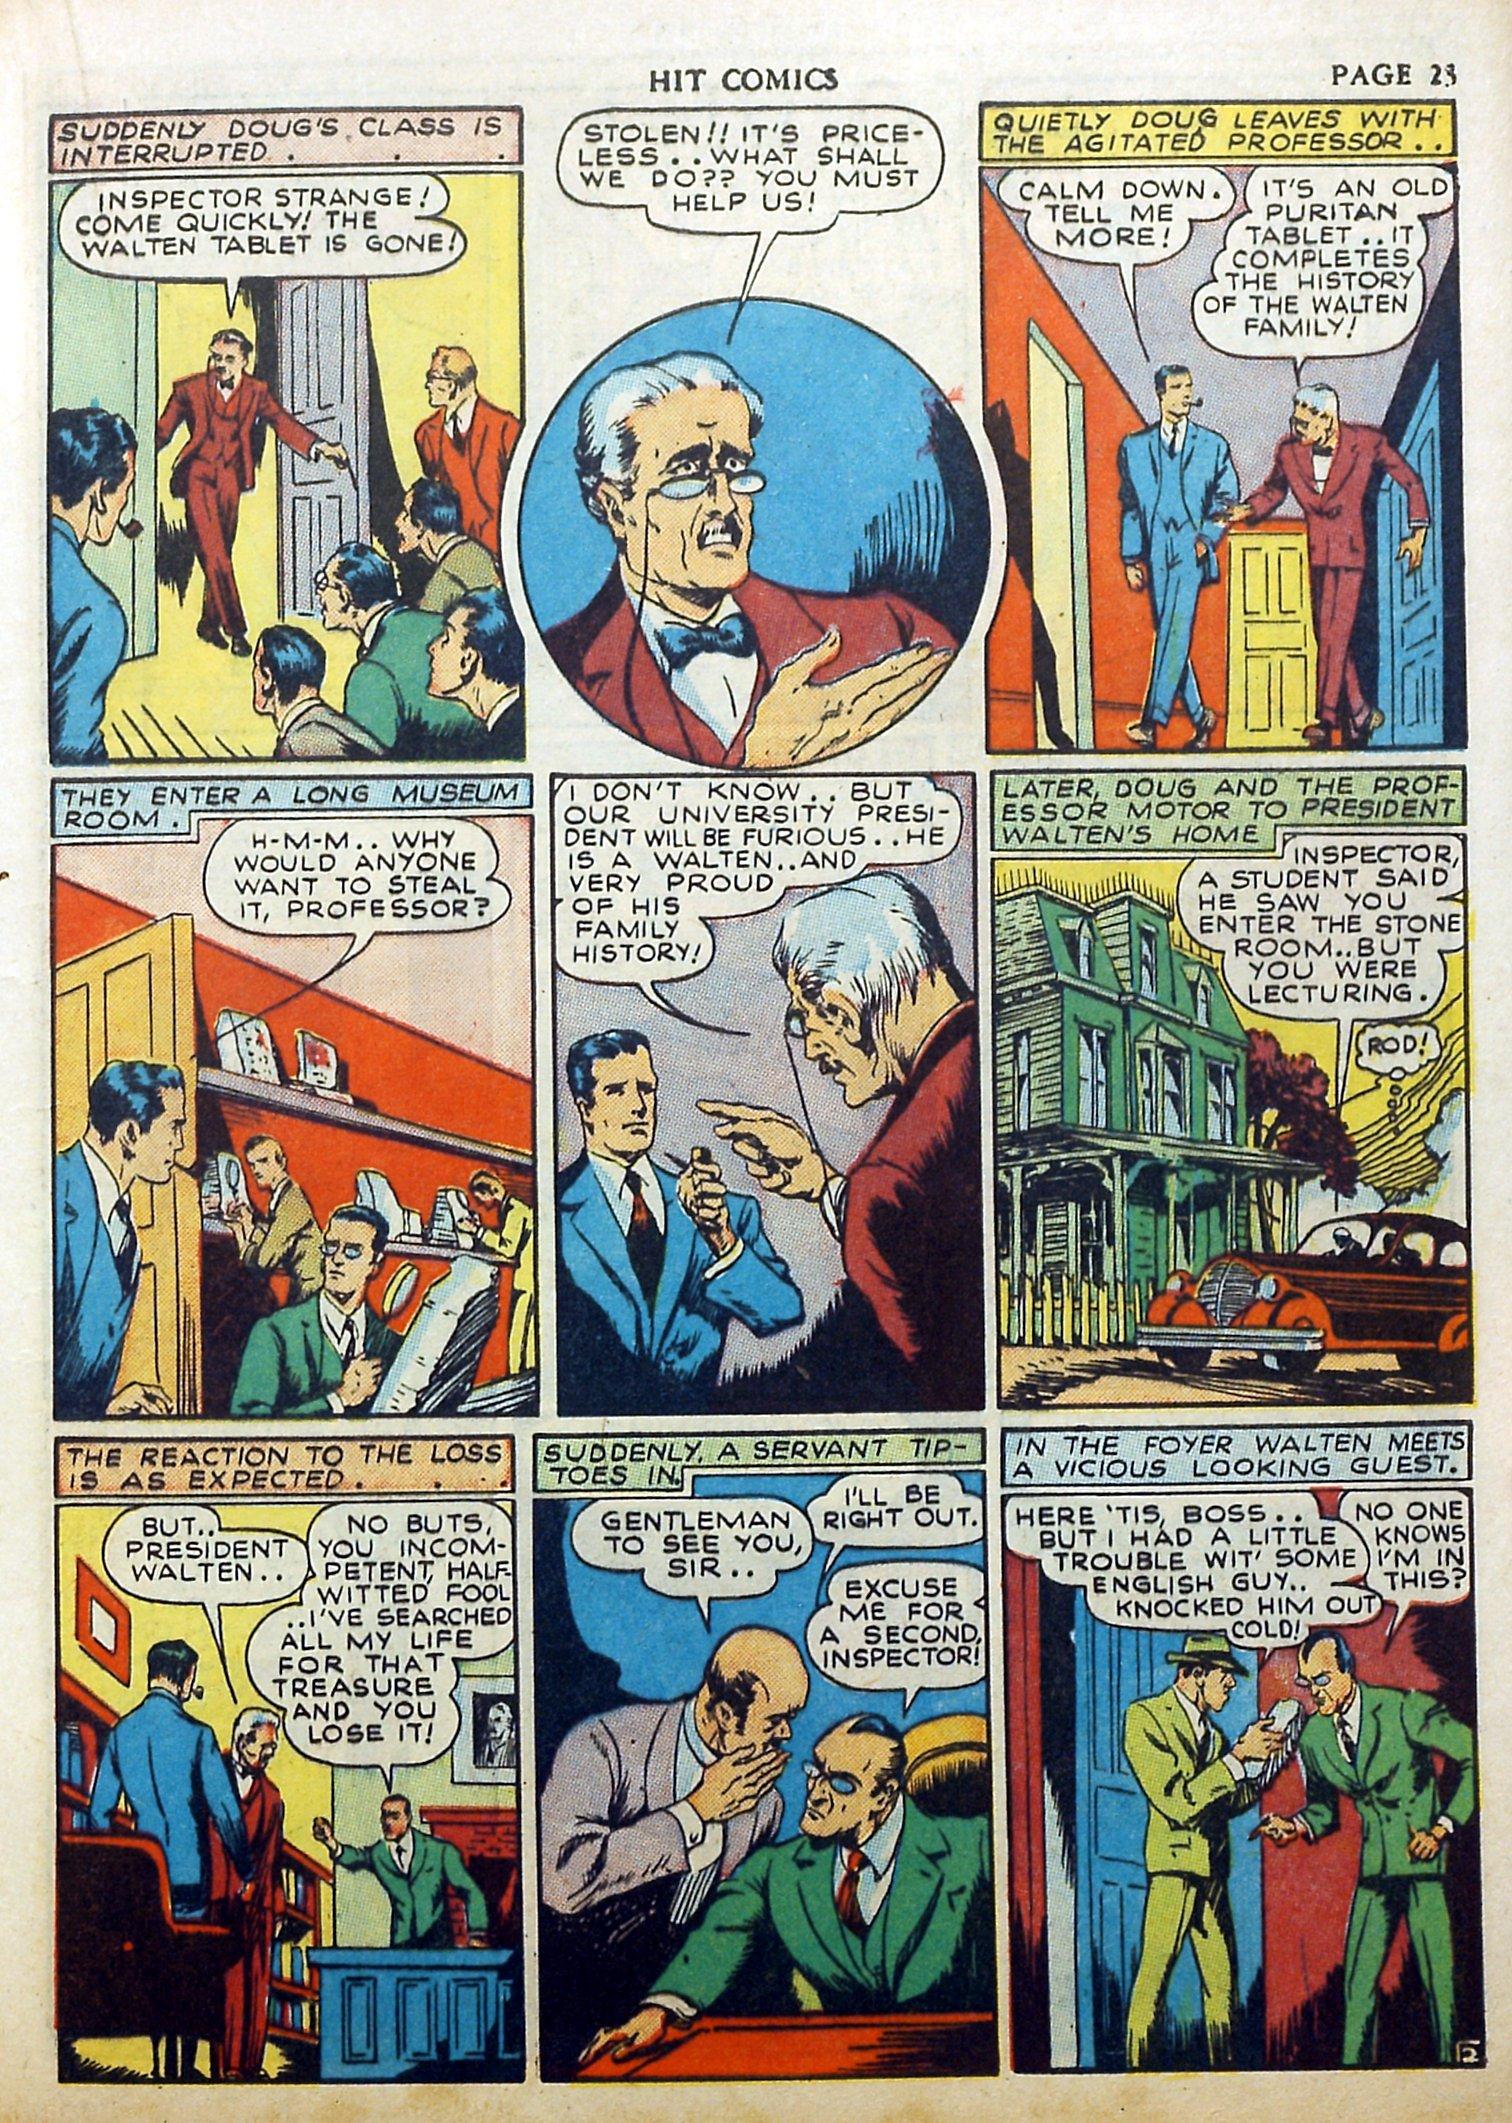 Read online Hit Comics comic -  Issue #17 - 25